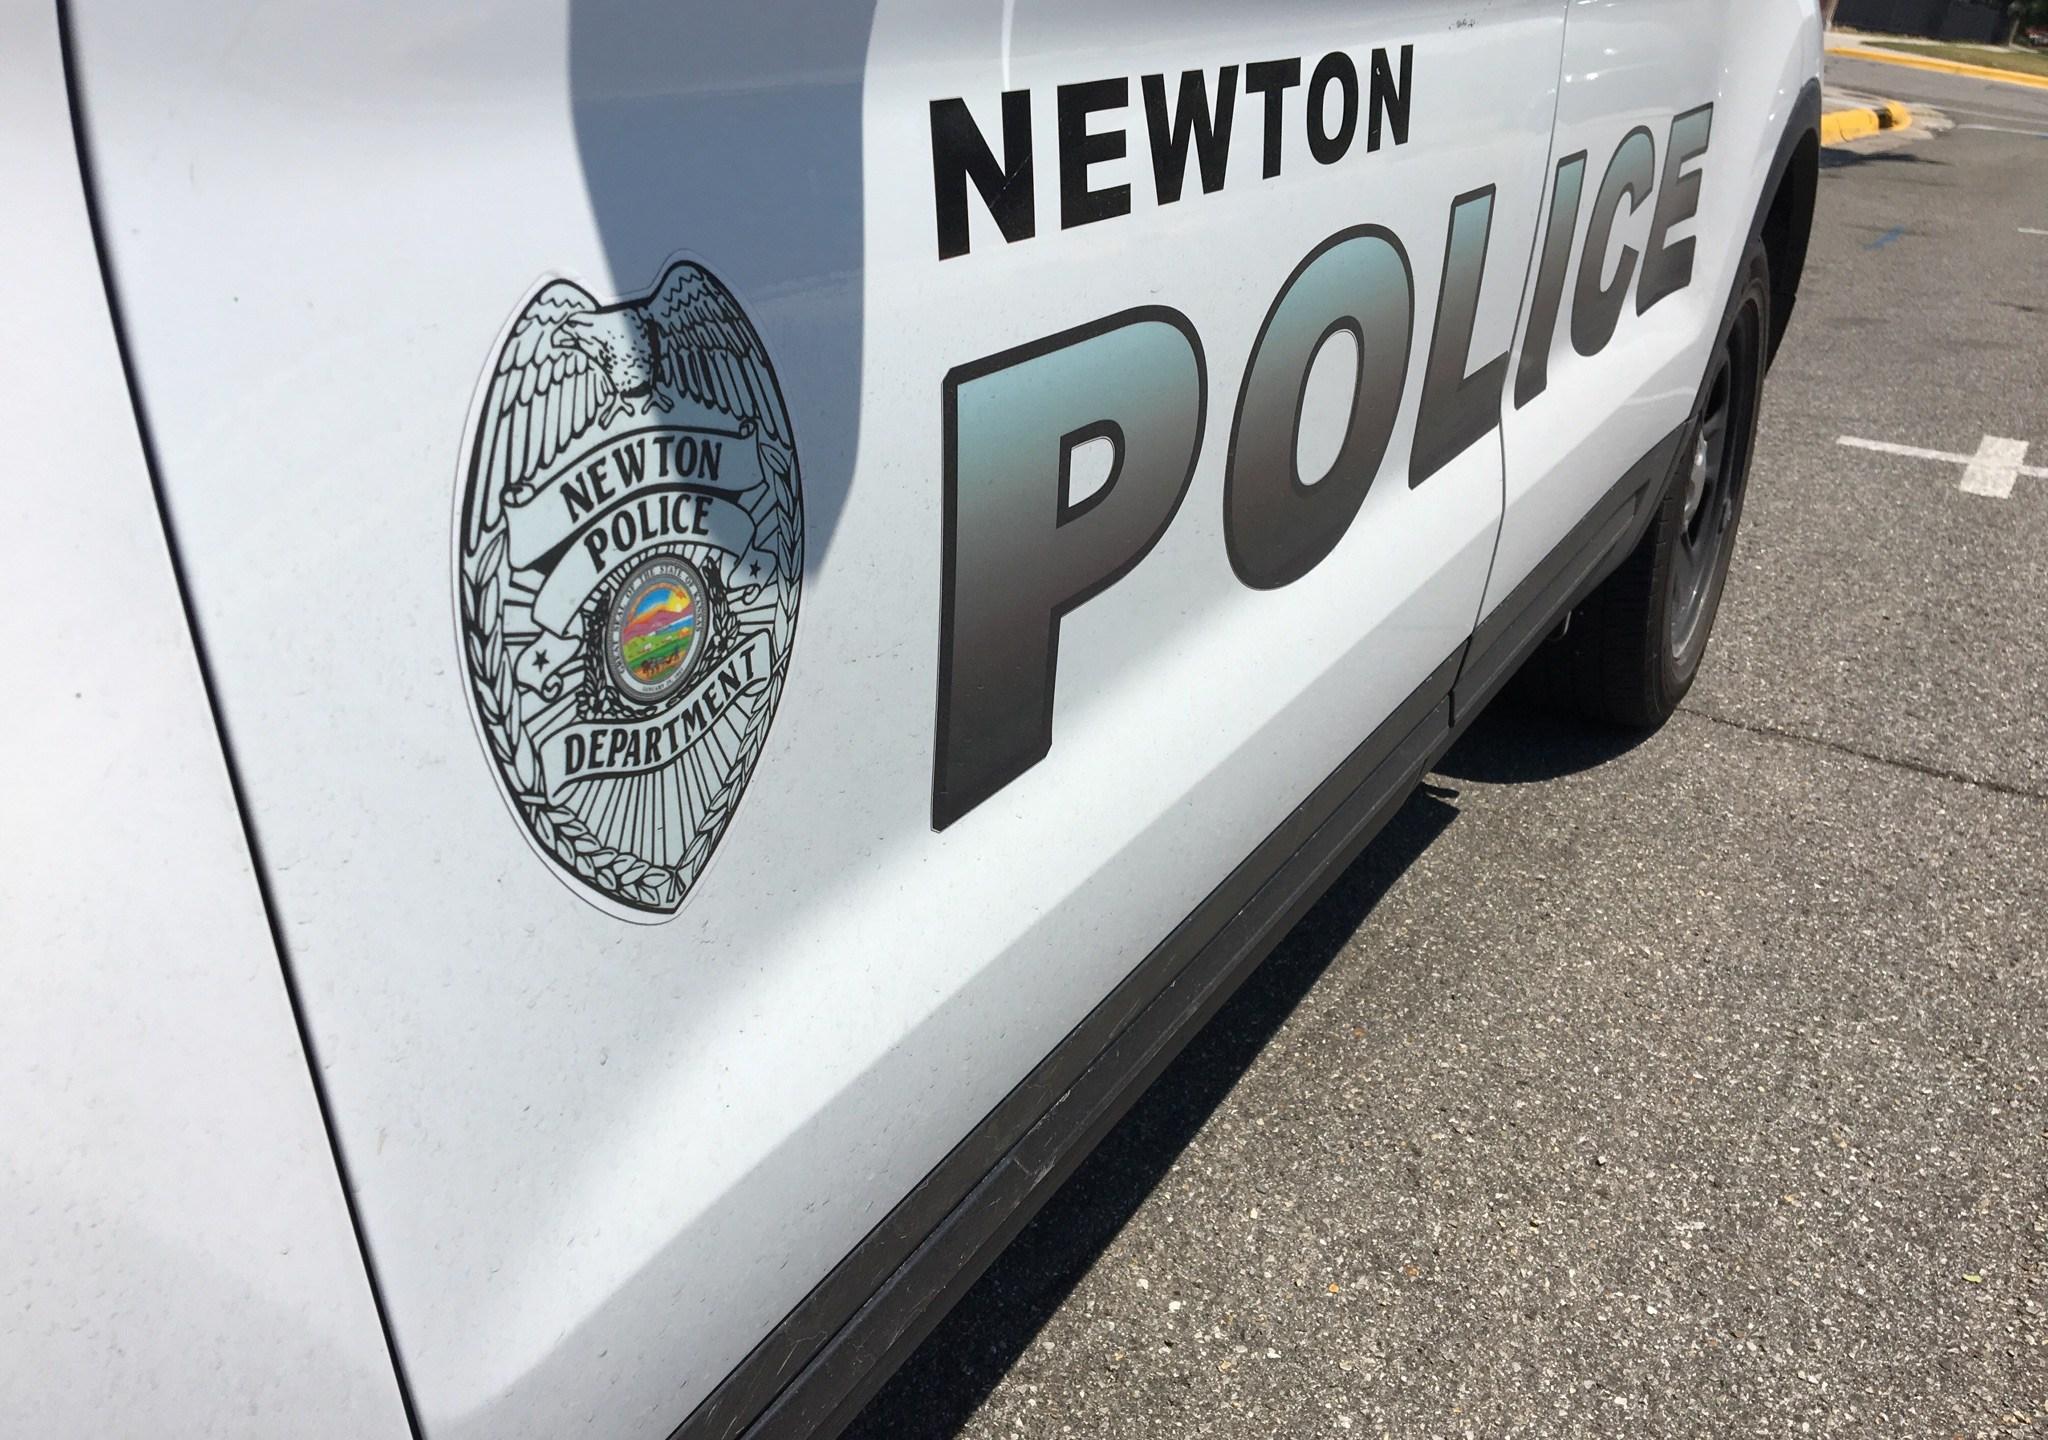 Newton Police Dept._413176